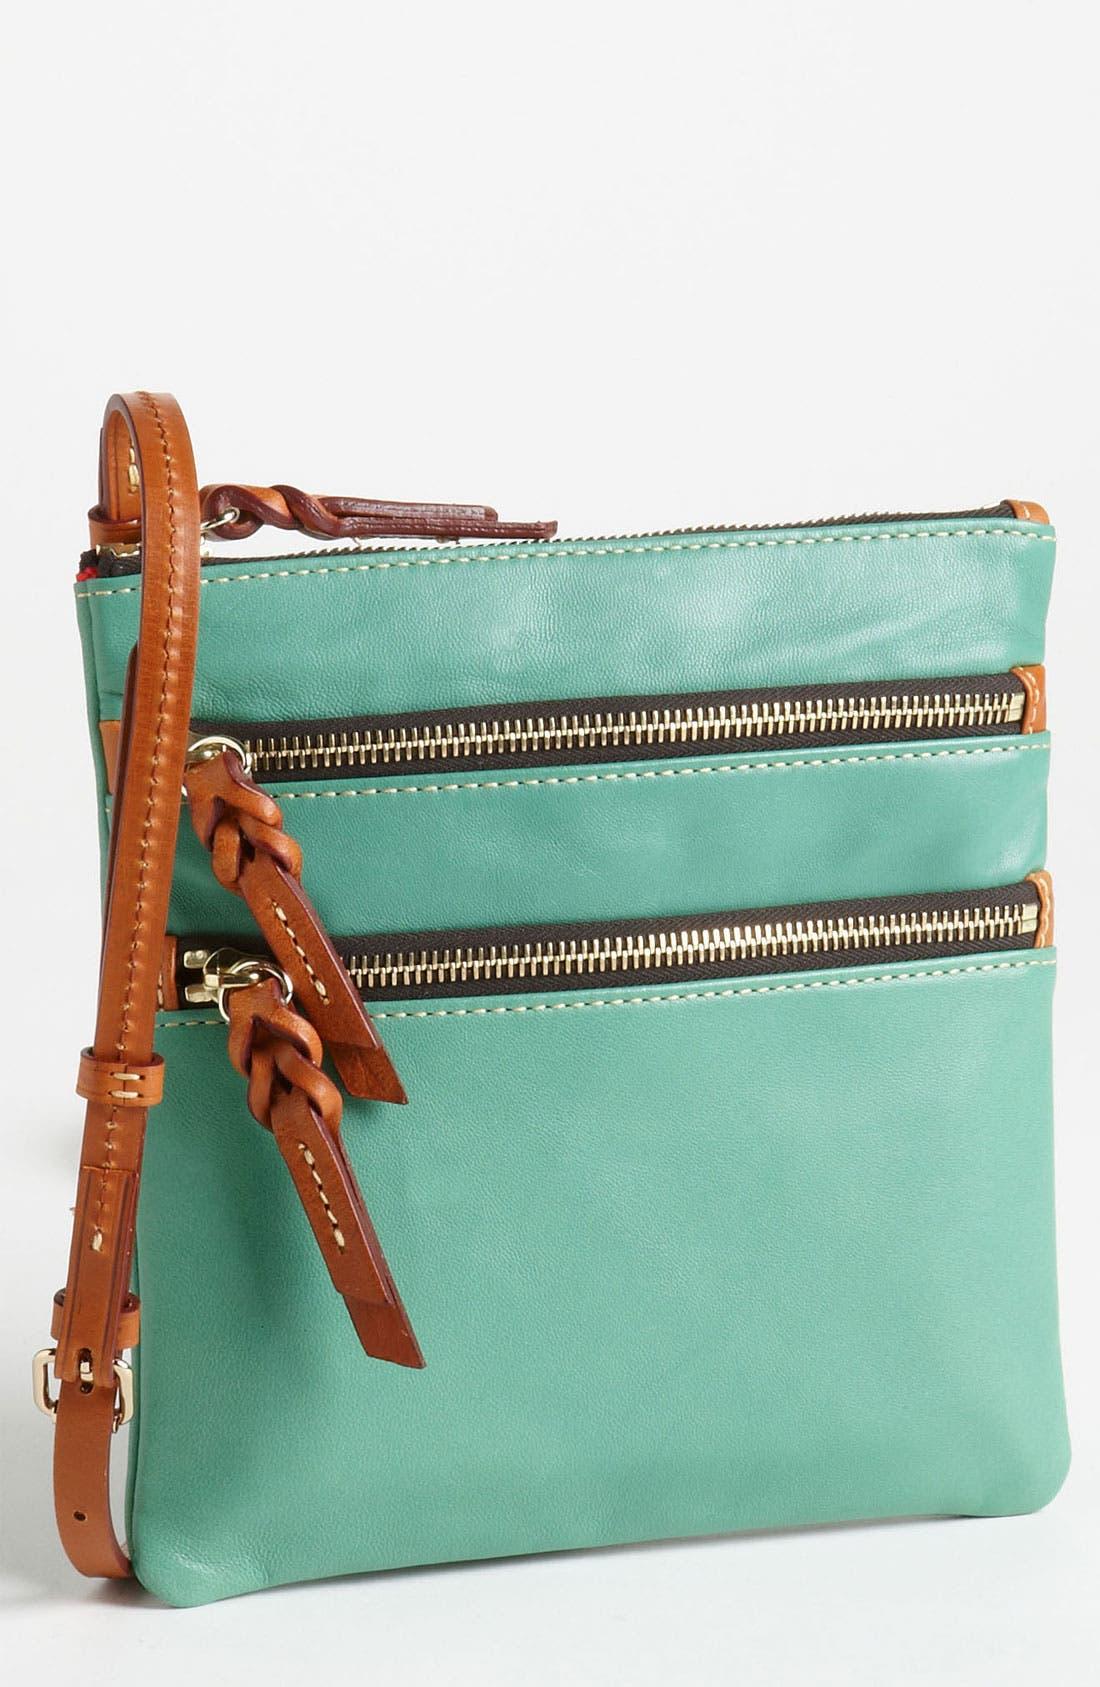 Main Image - Dooney & Bourke Triple Zip Leather Crossbody Bag